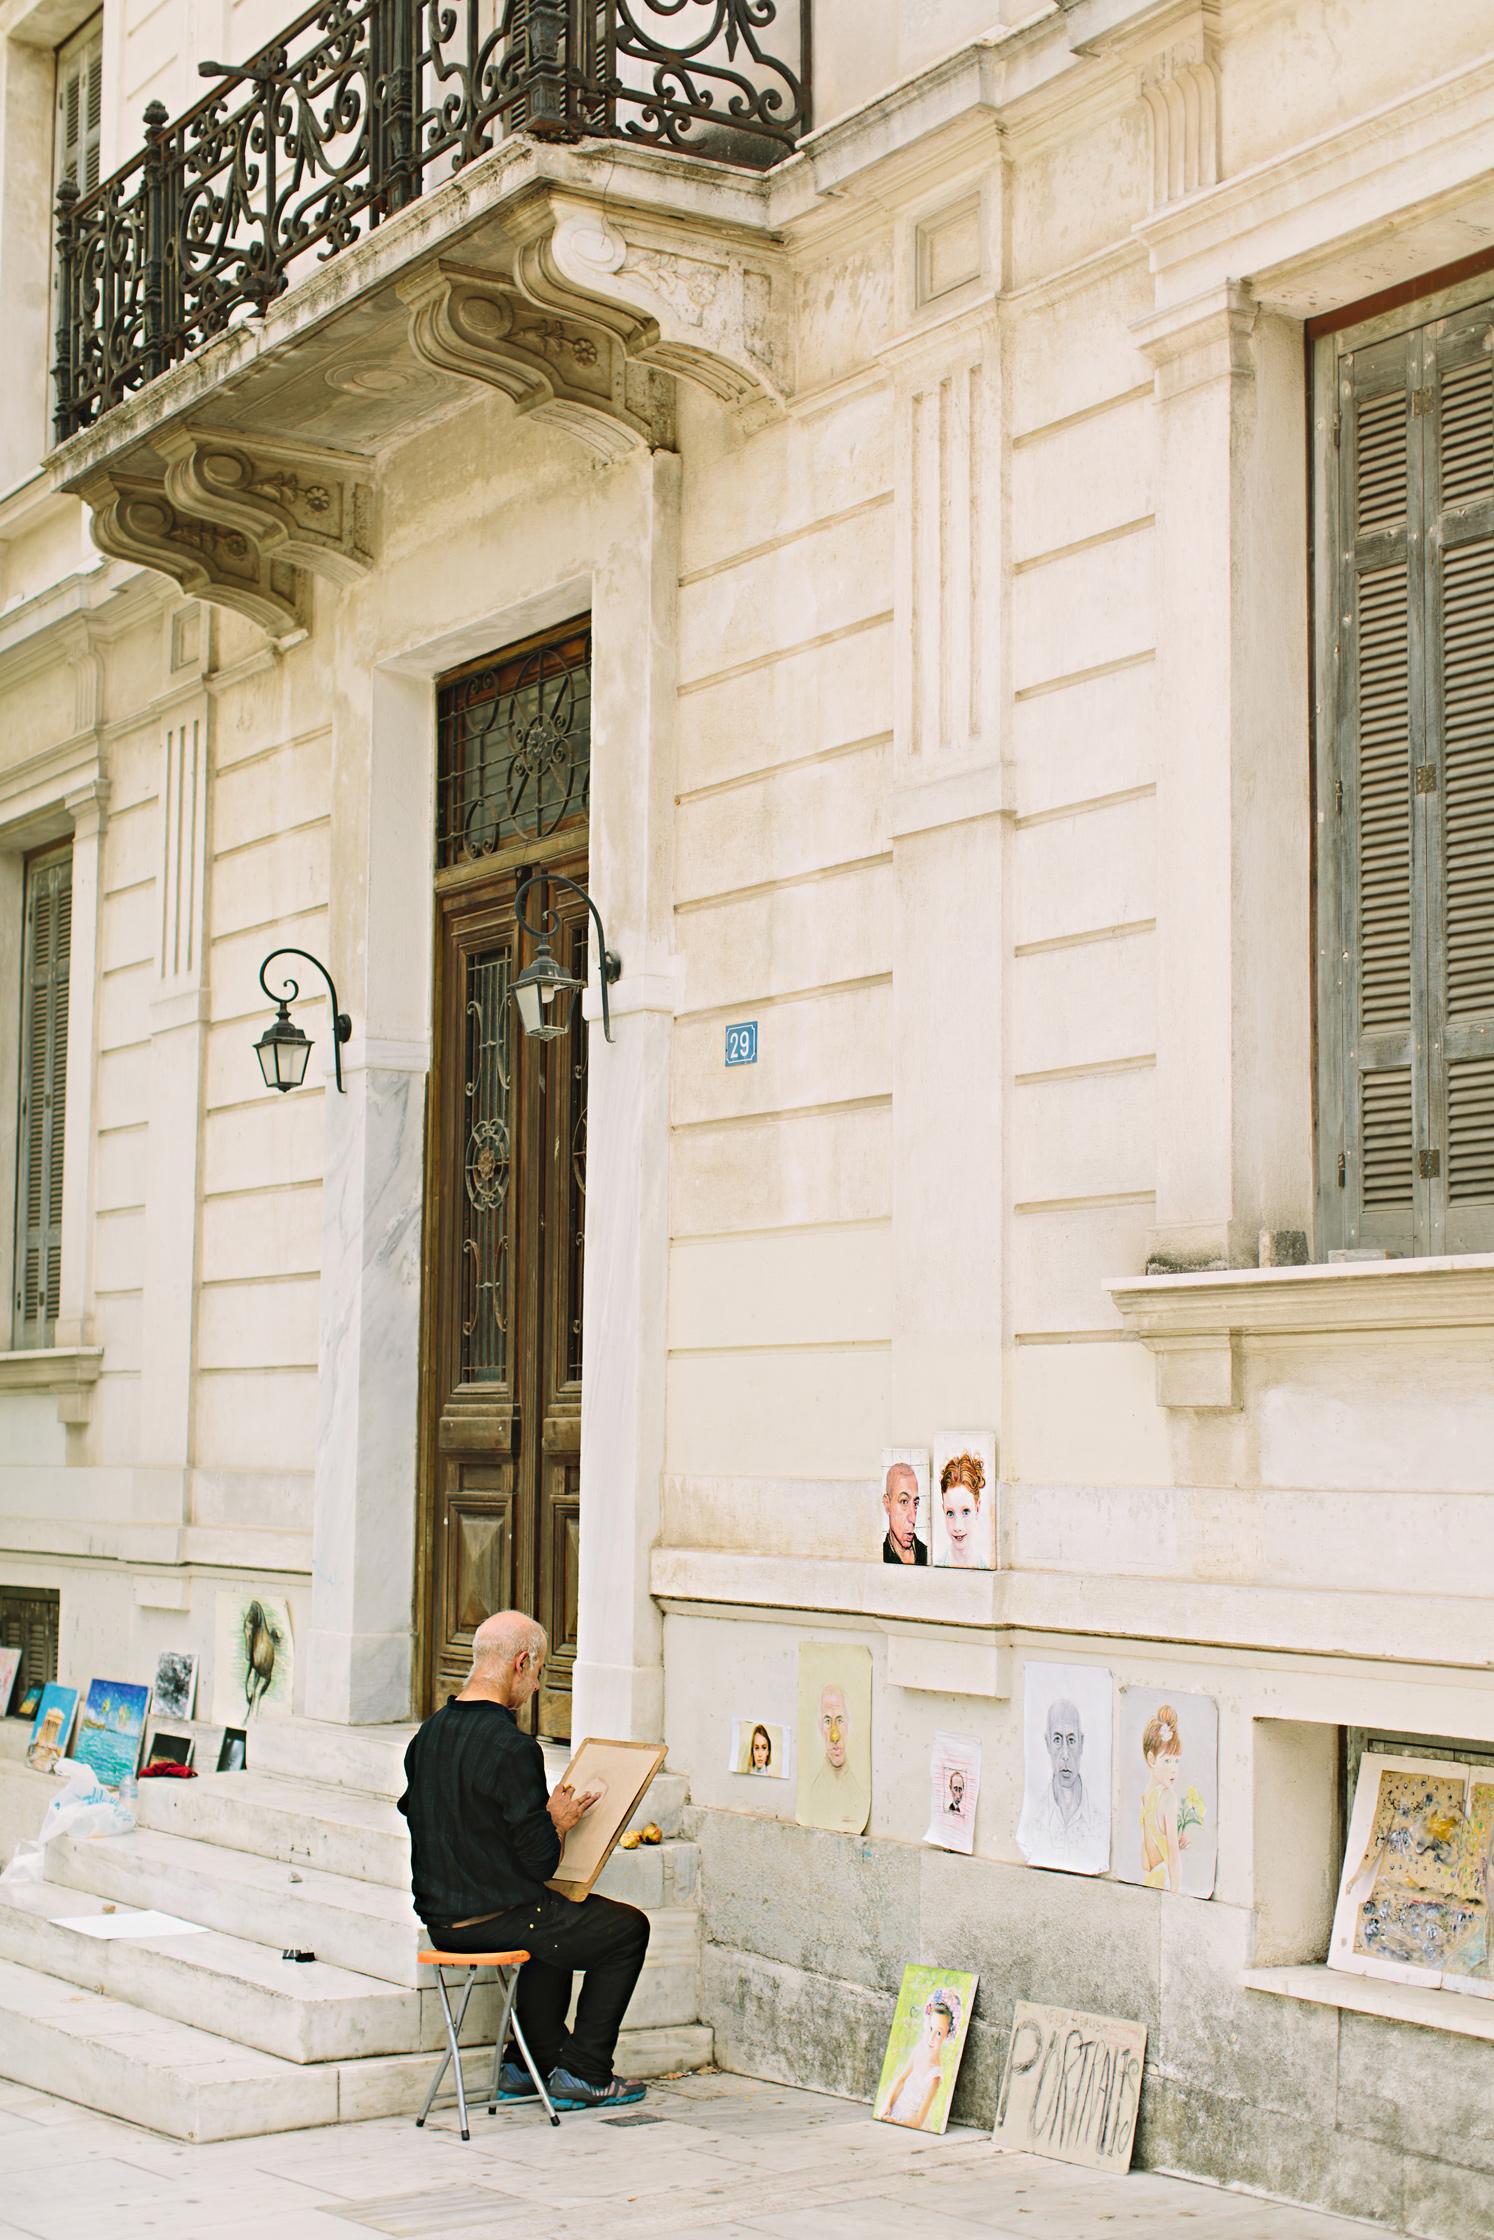 CindyGiovagnoli_Athens_Greece_travel_photographer-050.jpg